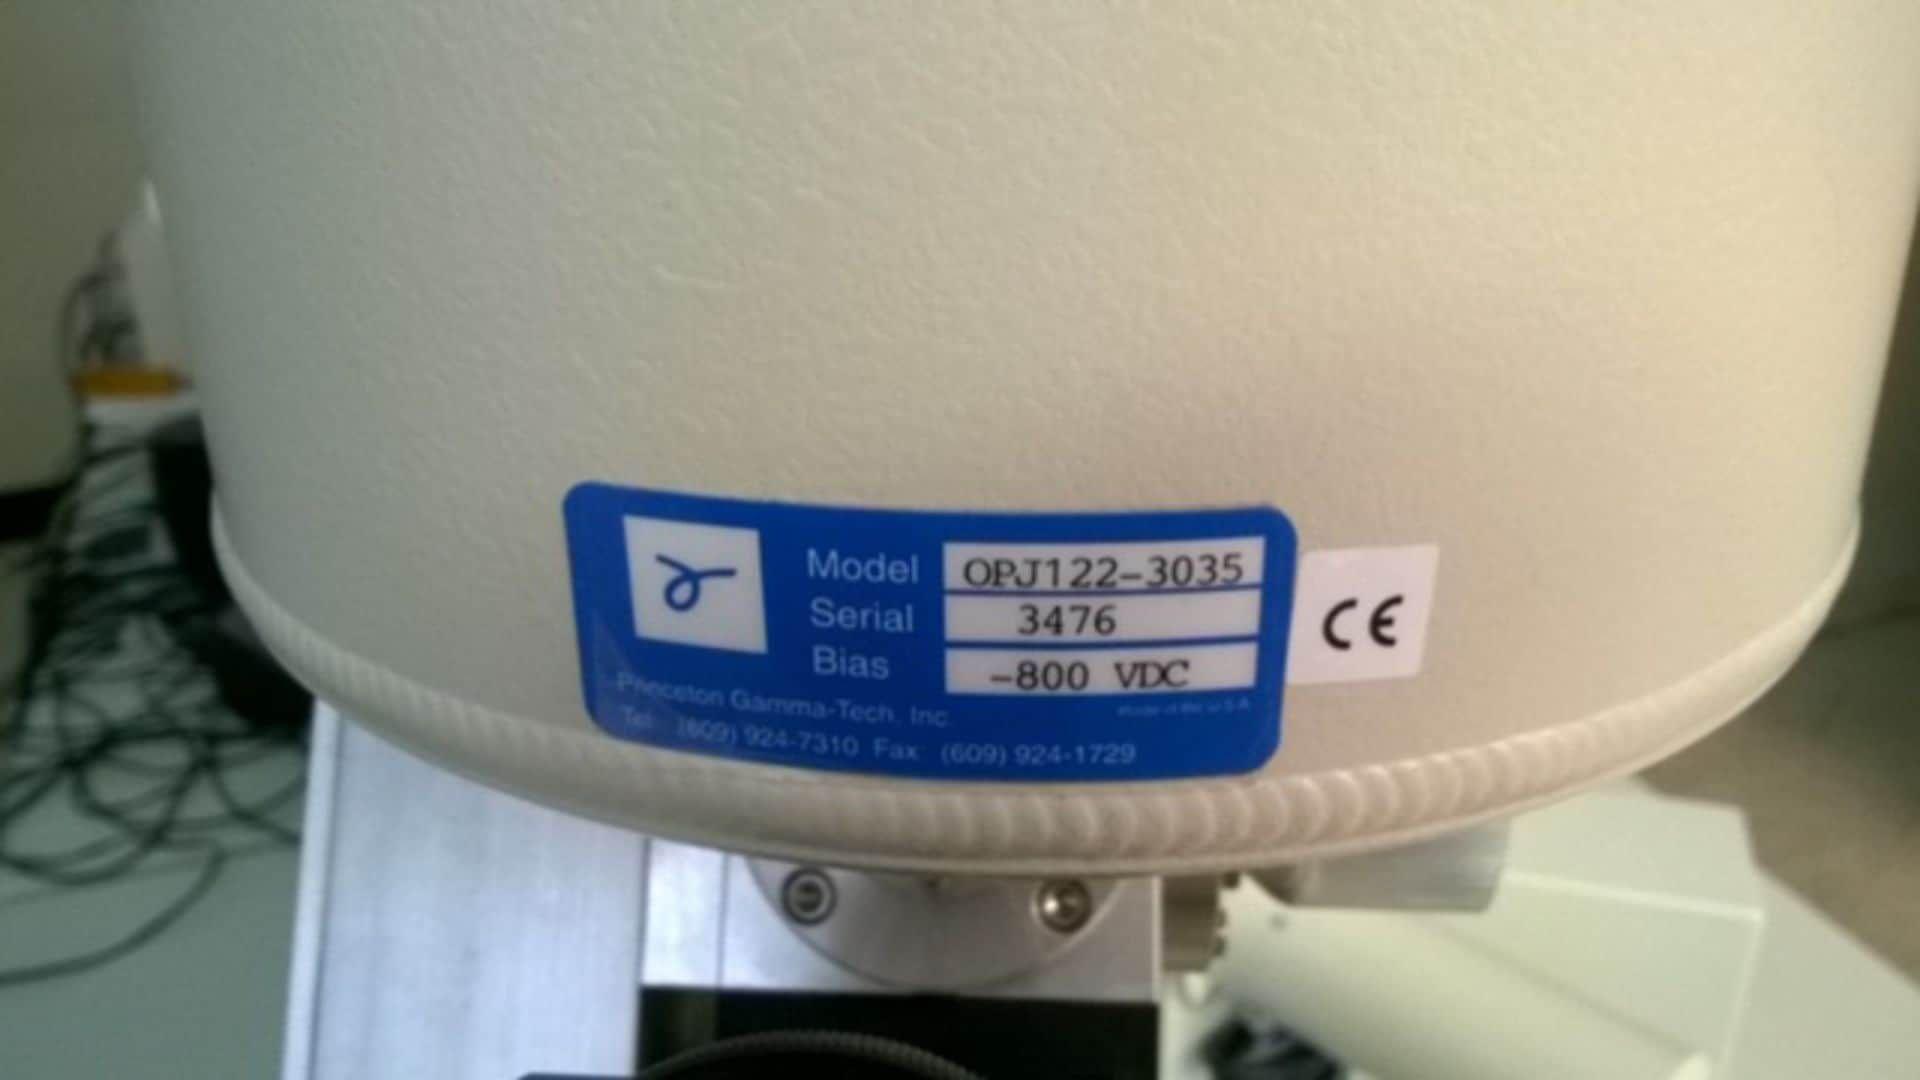 JEOL JSM-6360LV SCANNING ELECTRON MICROSCOPE W/ PRINCETON GAMMA TECH OPJ122-3035